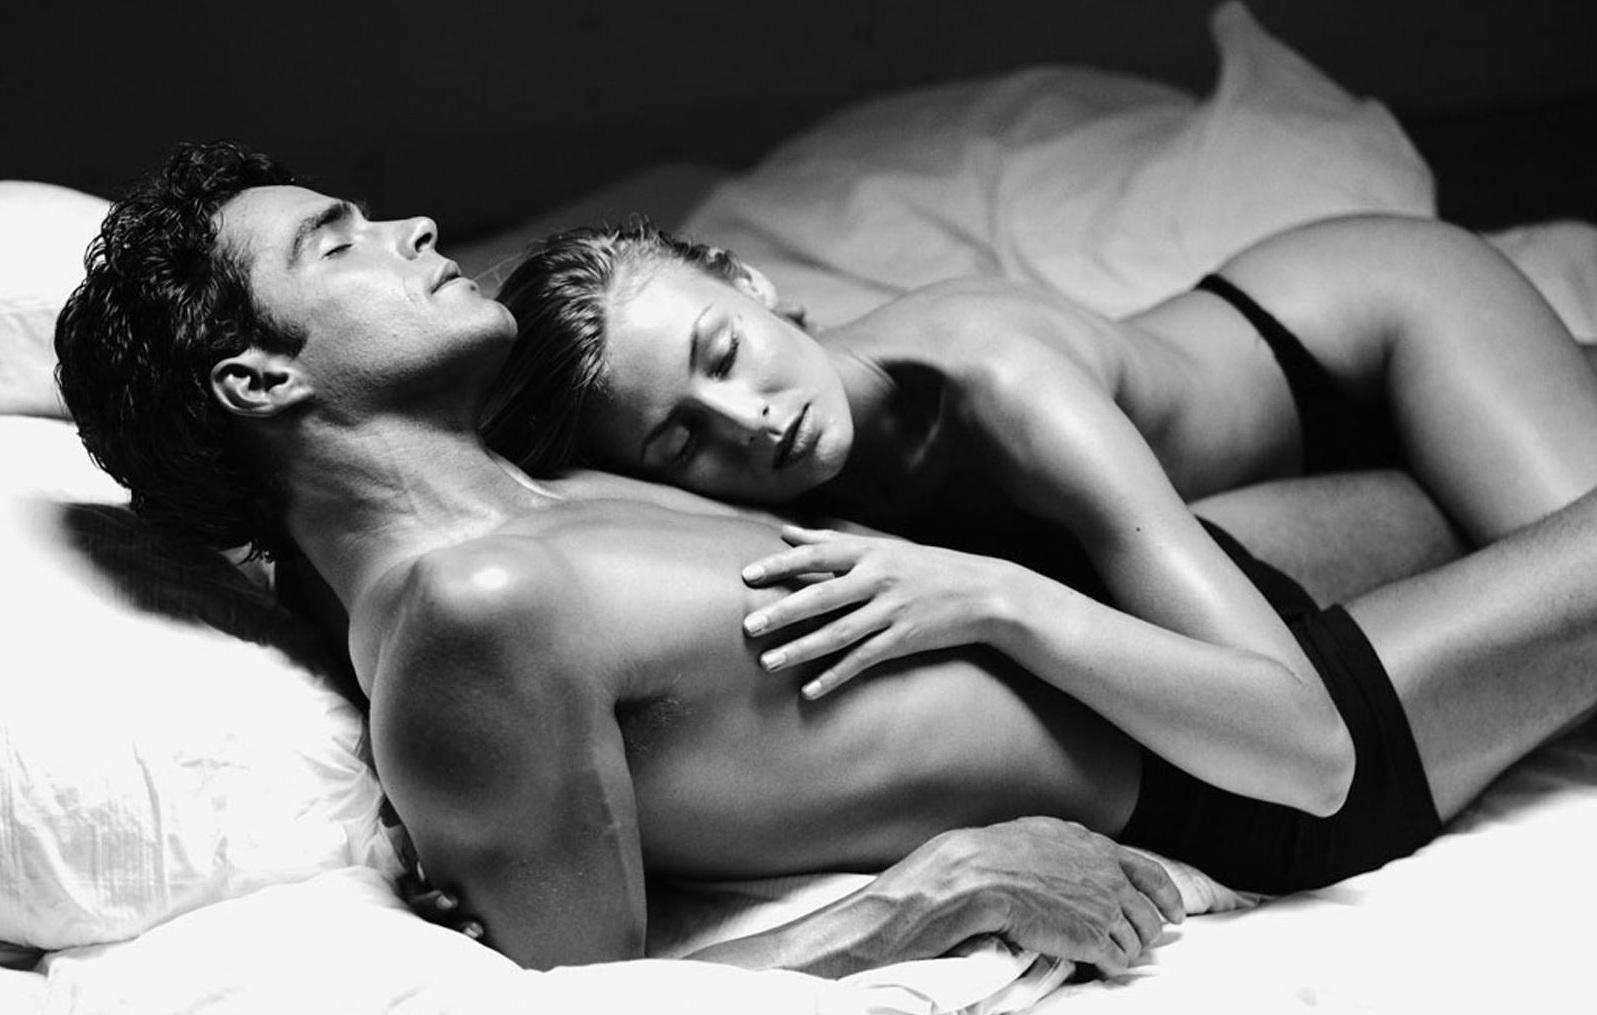 Ни секса ни мастурбации просто красота тела